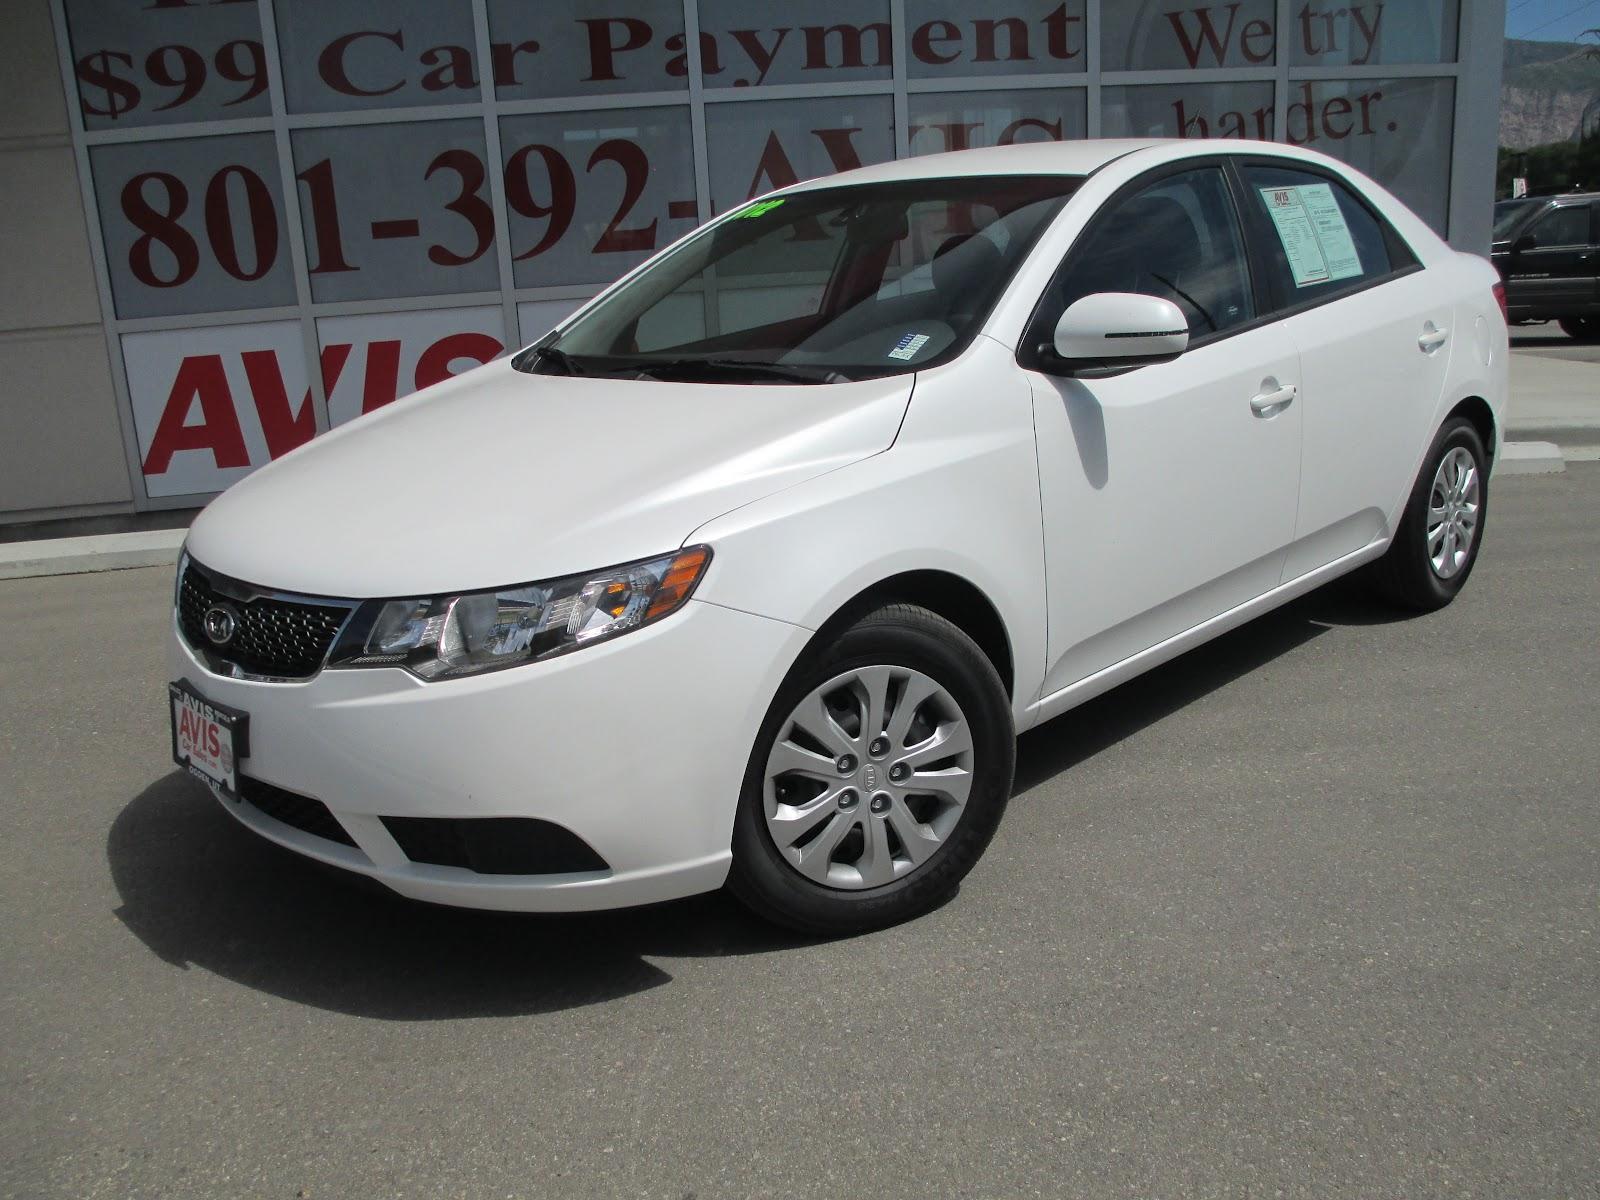 Avis Car Sales News